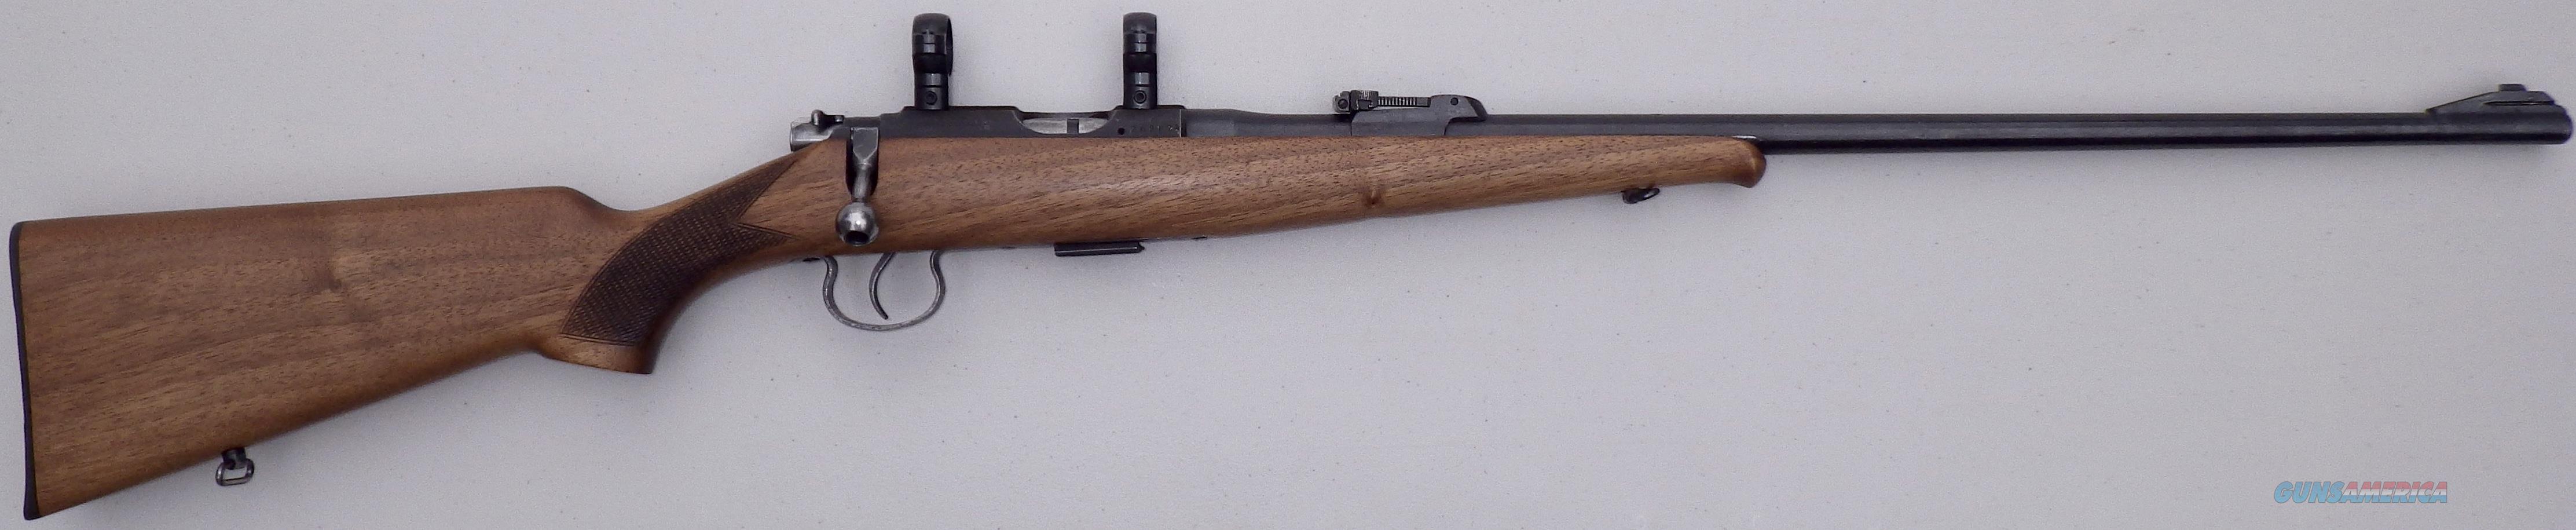 CZ / BRNO Model 2 .22 LR, 1977, CAI, sights, ri... for sale